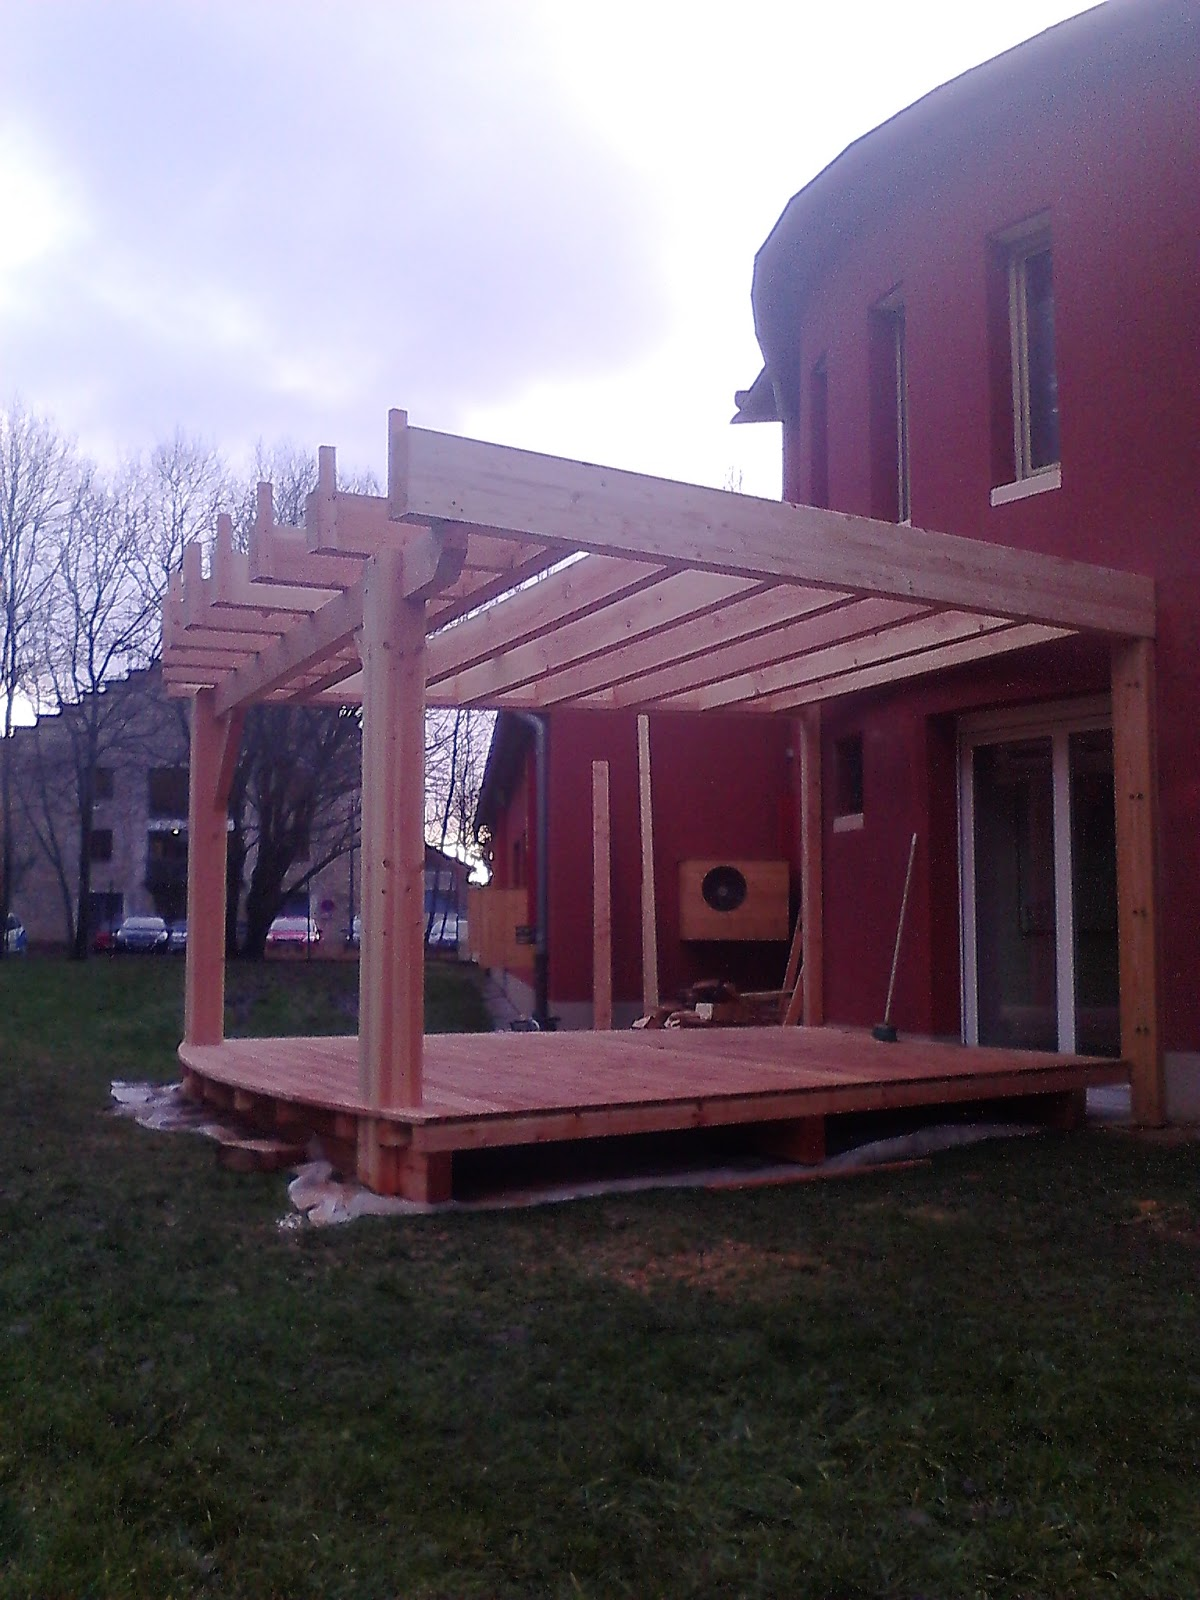 Retacchi baticoop janvier 2016 for La toiture terrasse